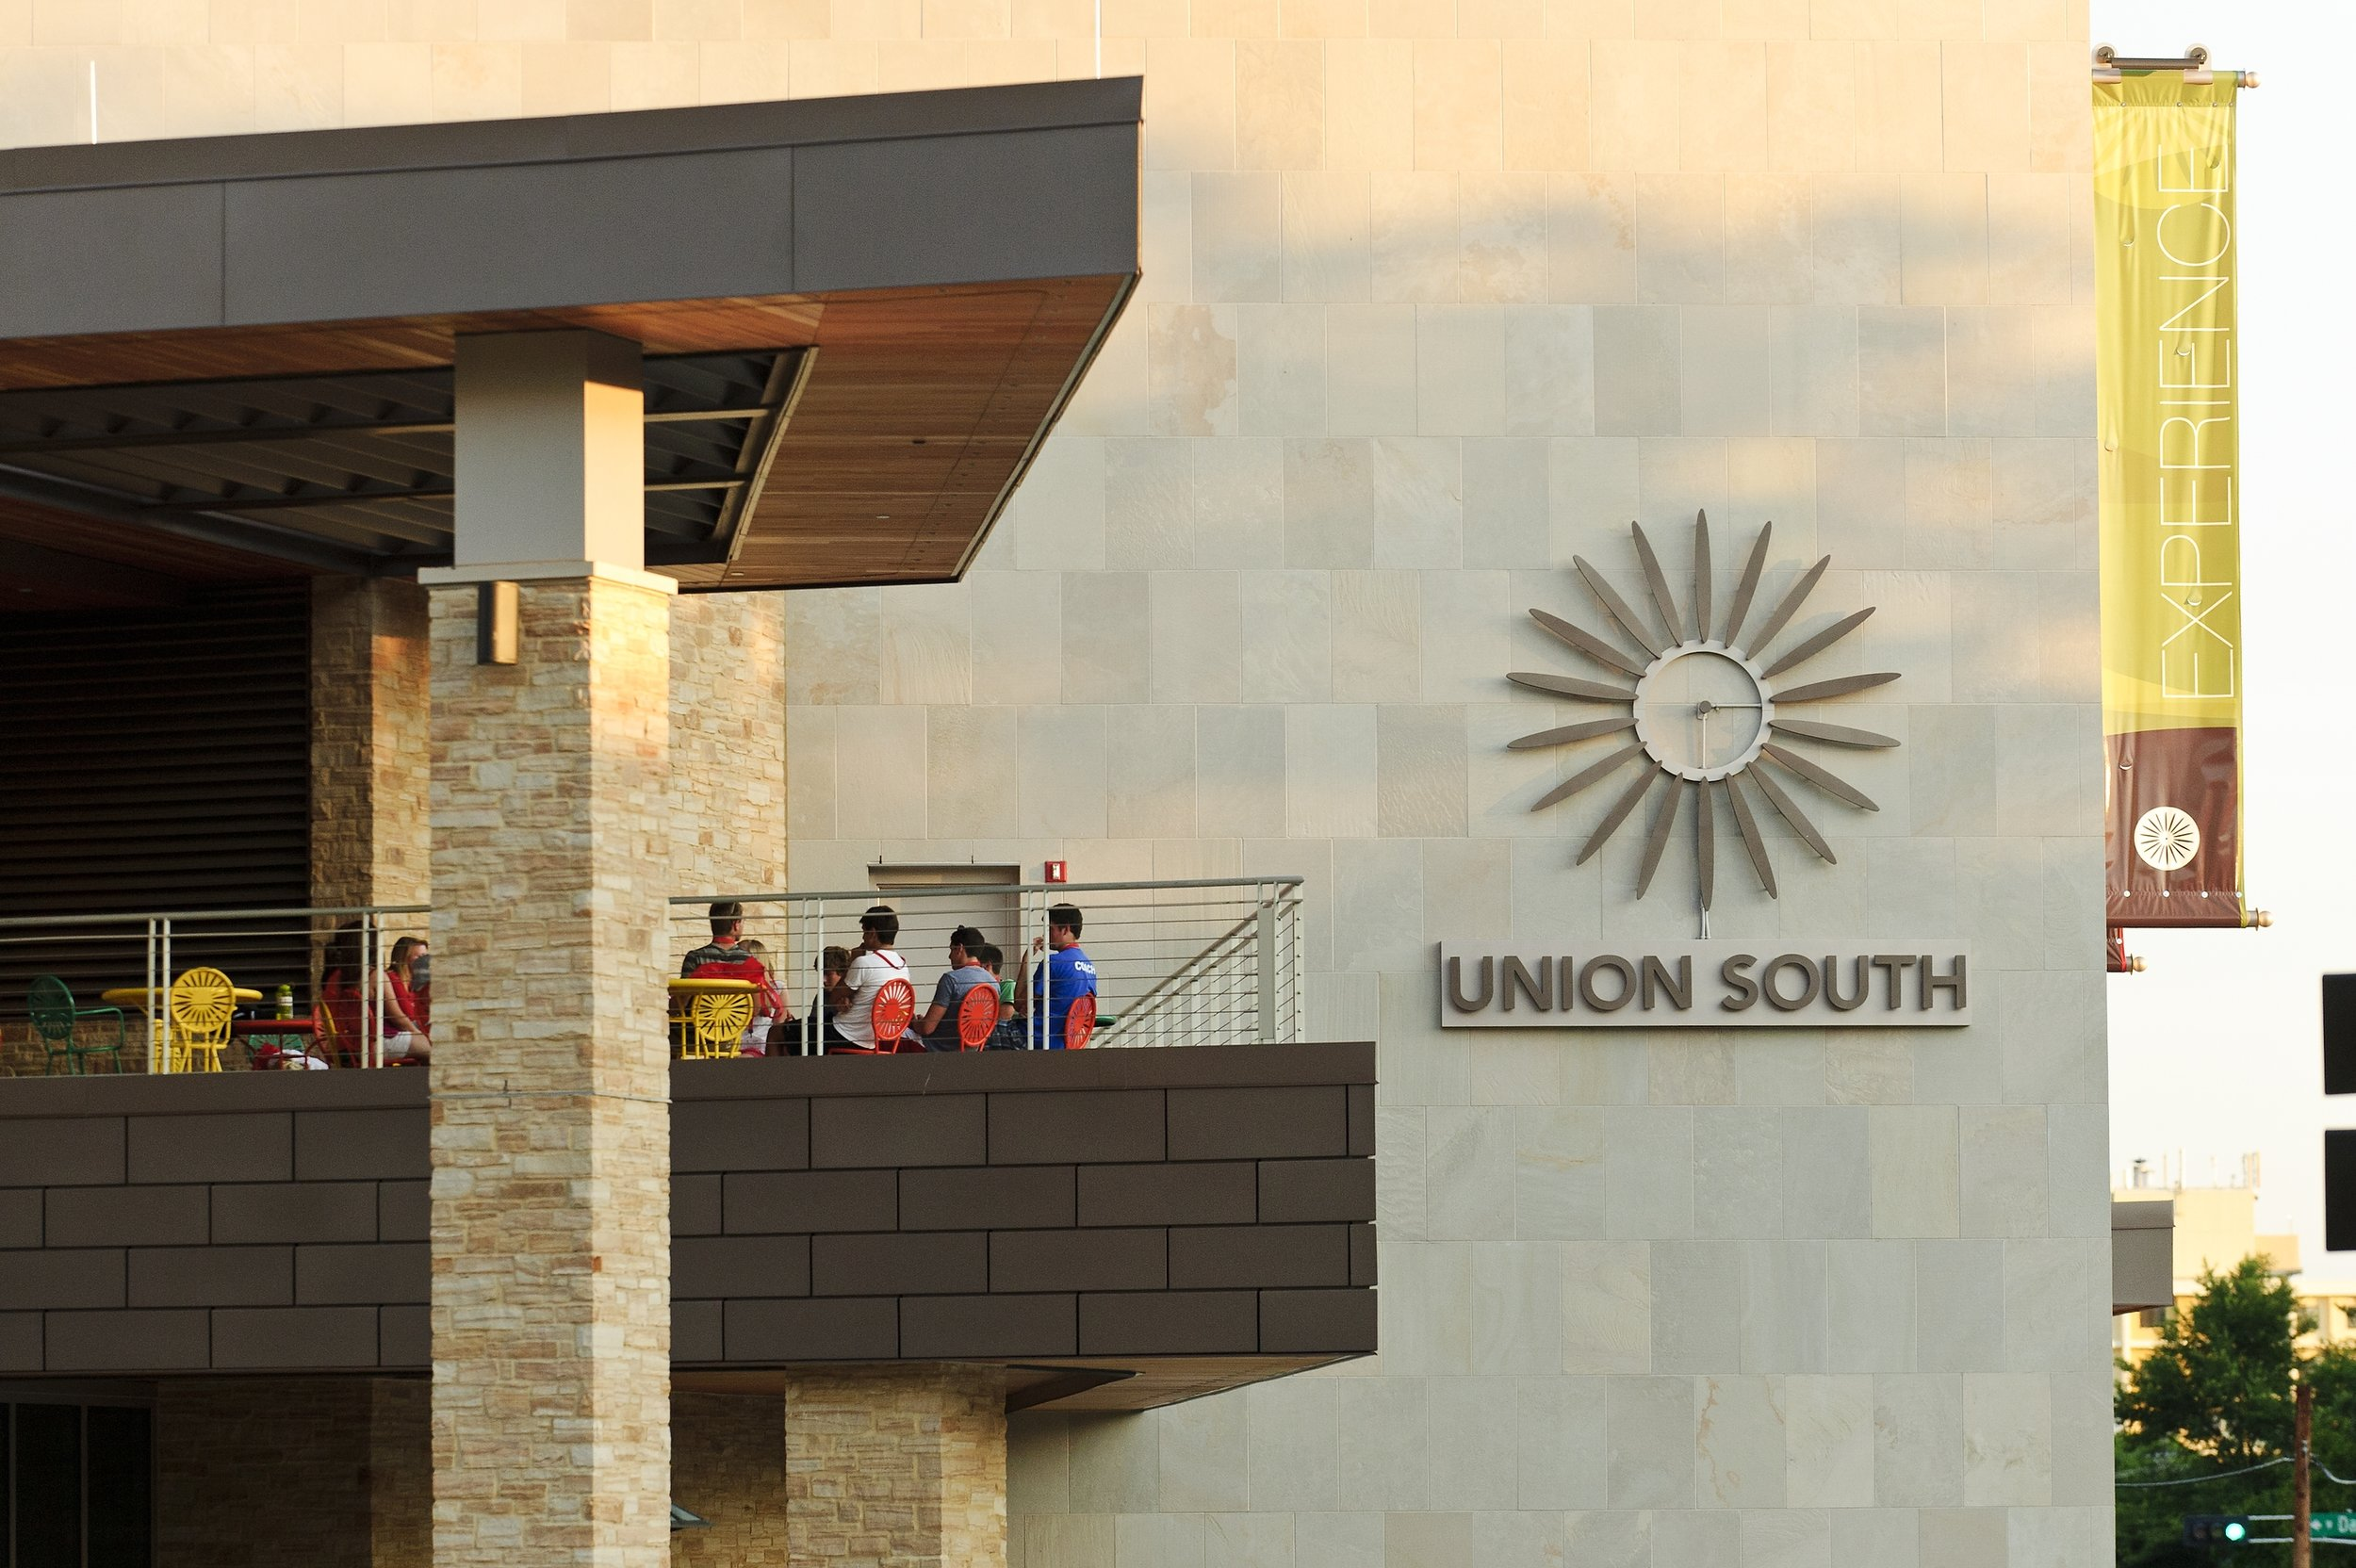 Union_South11_7313.JPG